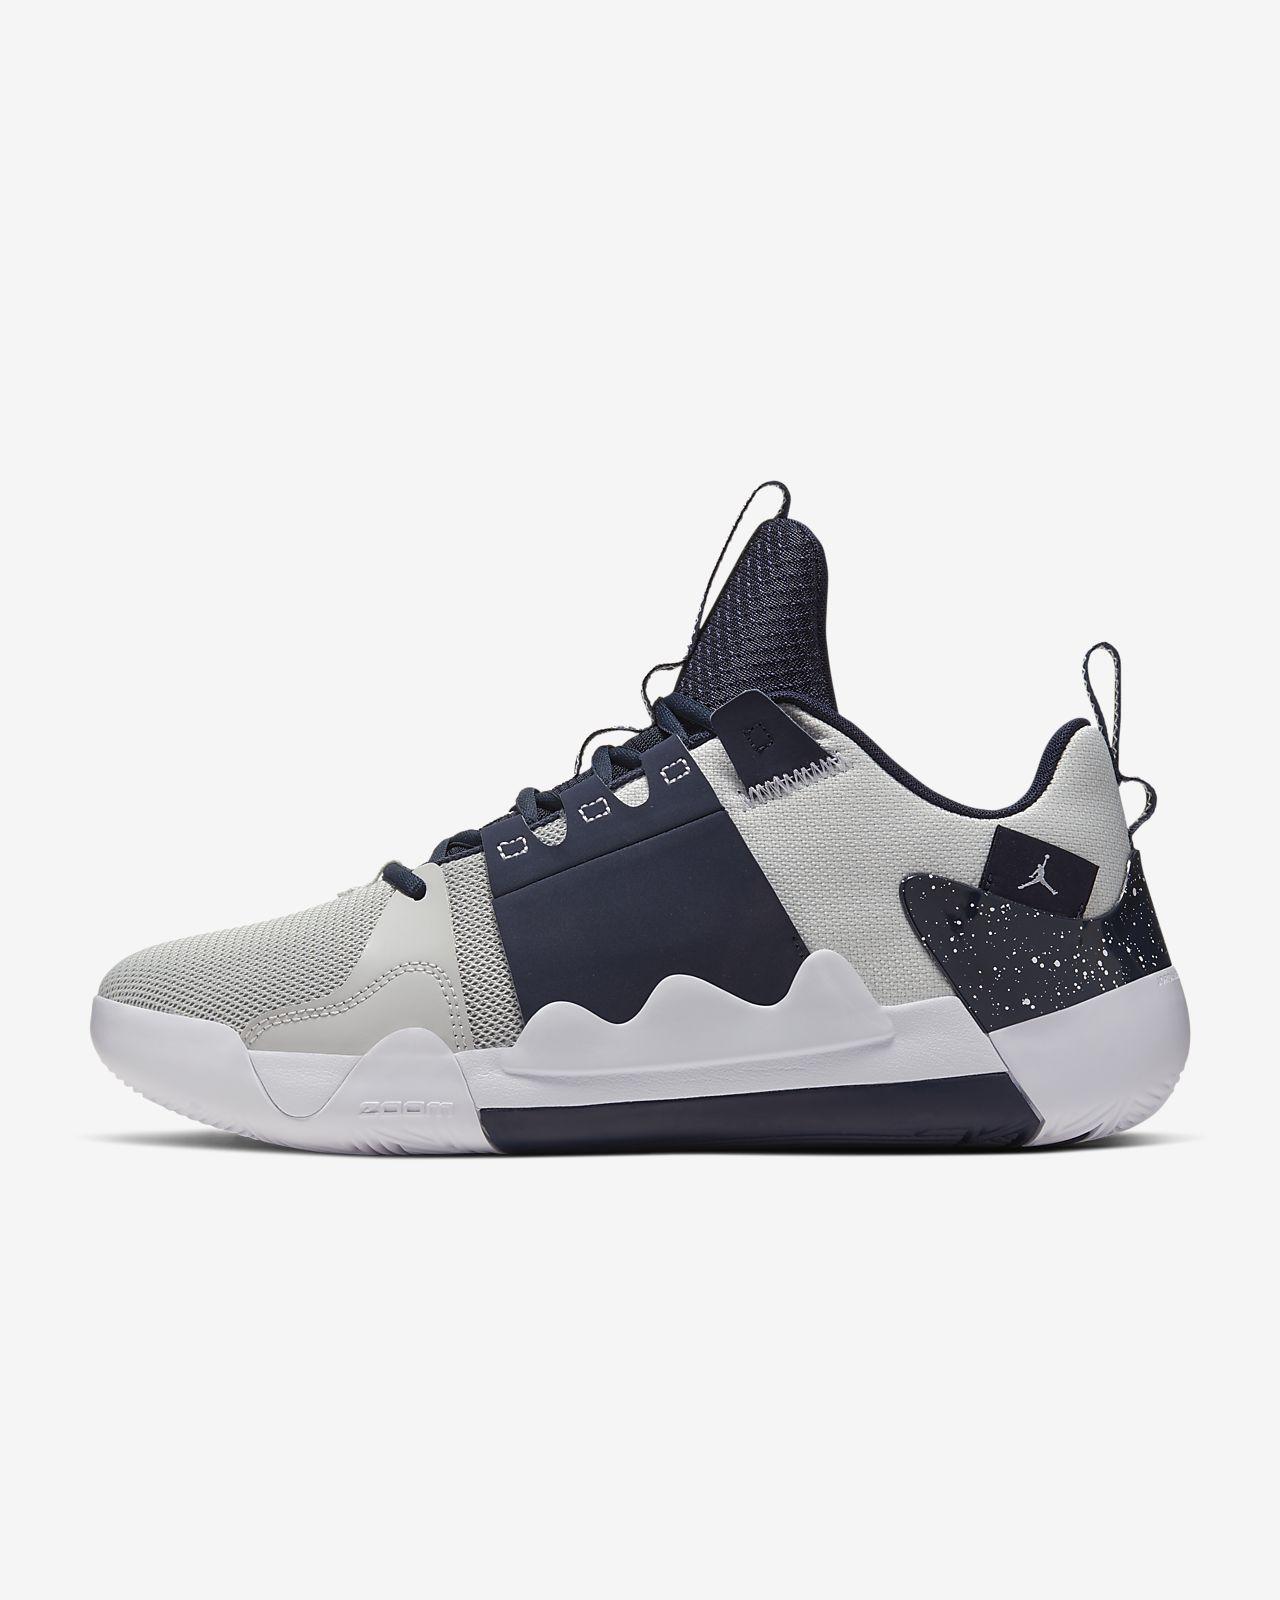 Jordan Zoom Zero Gravity PF男子篮球鞋